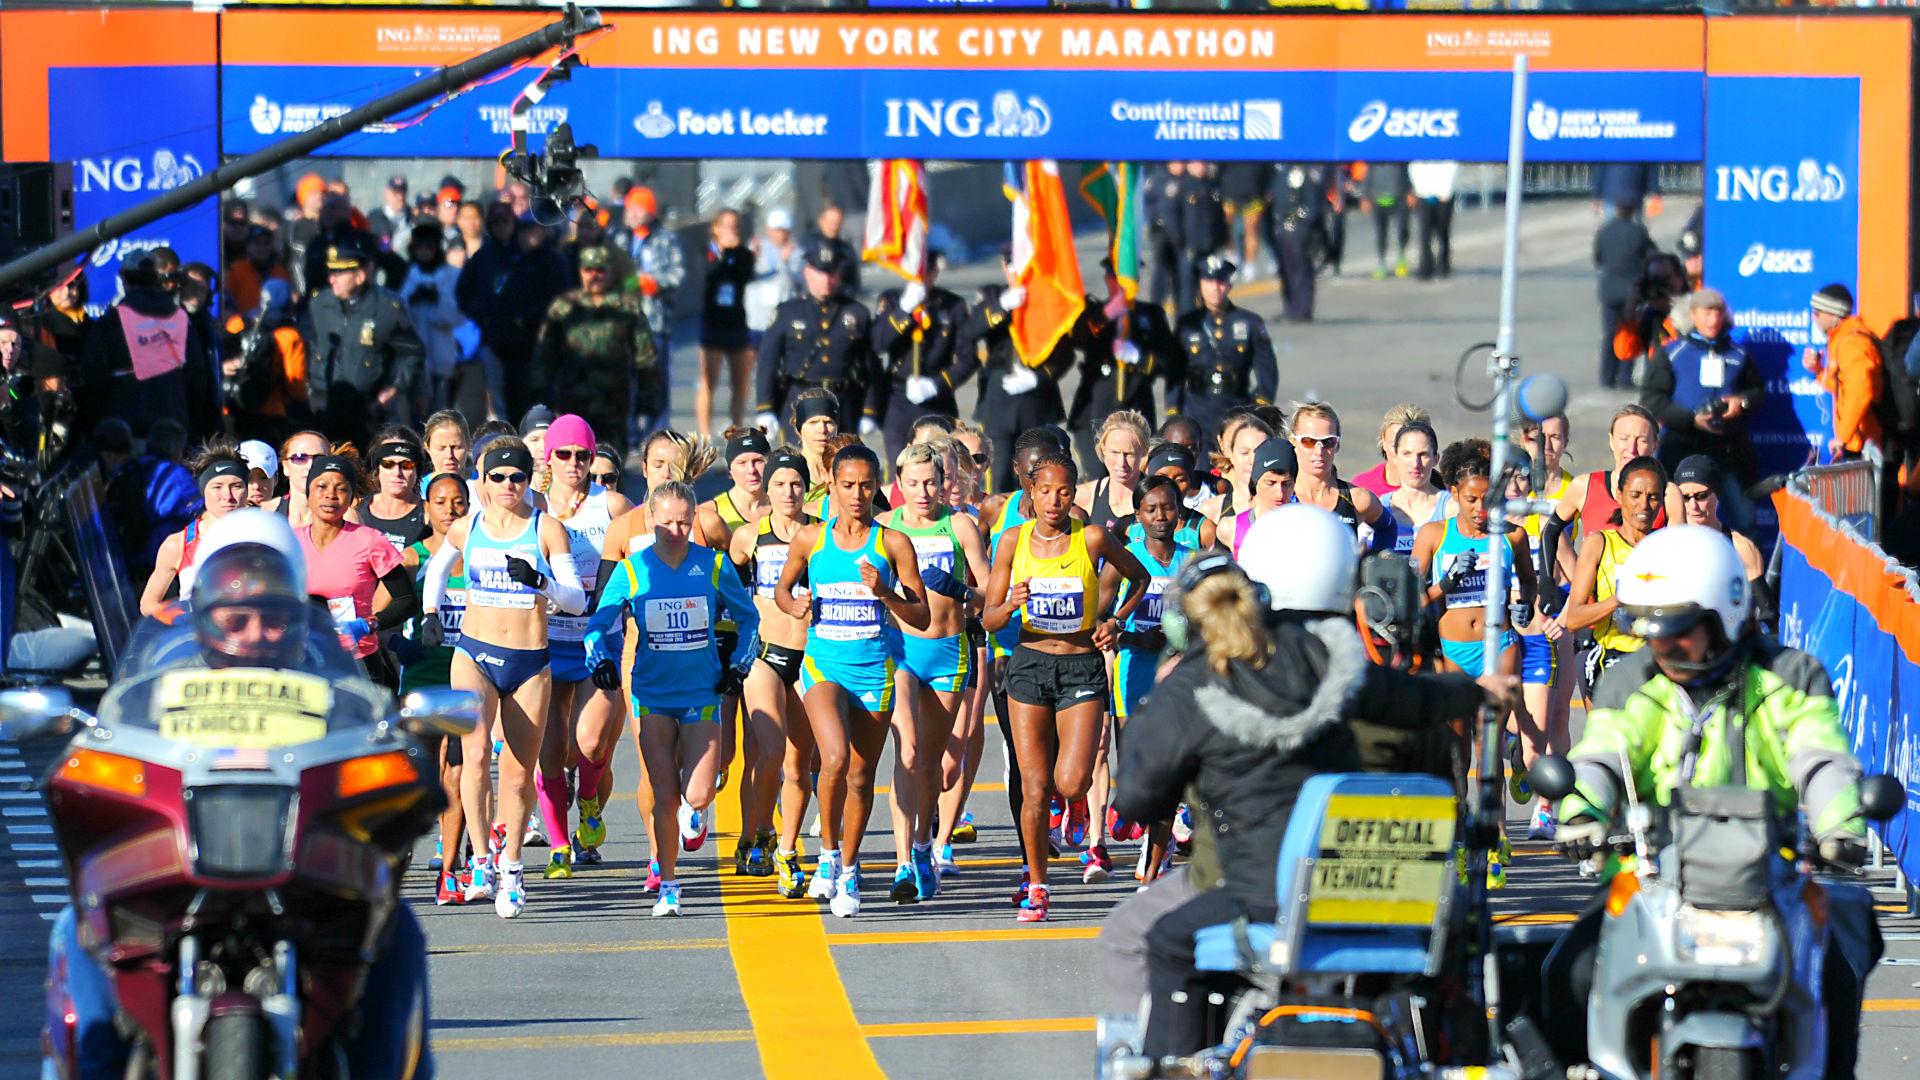 How to run a marathon the safe, healthy way